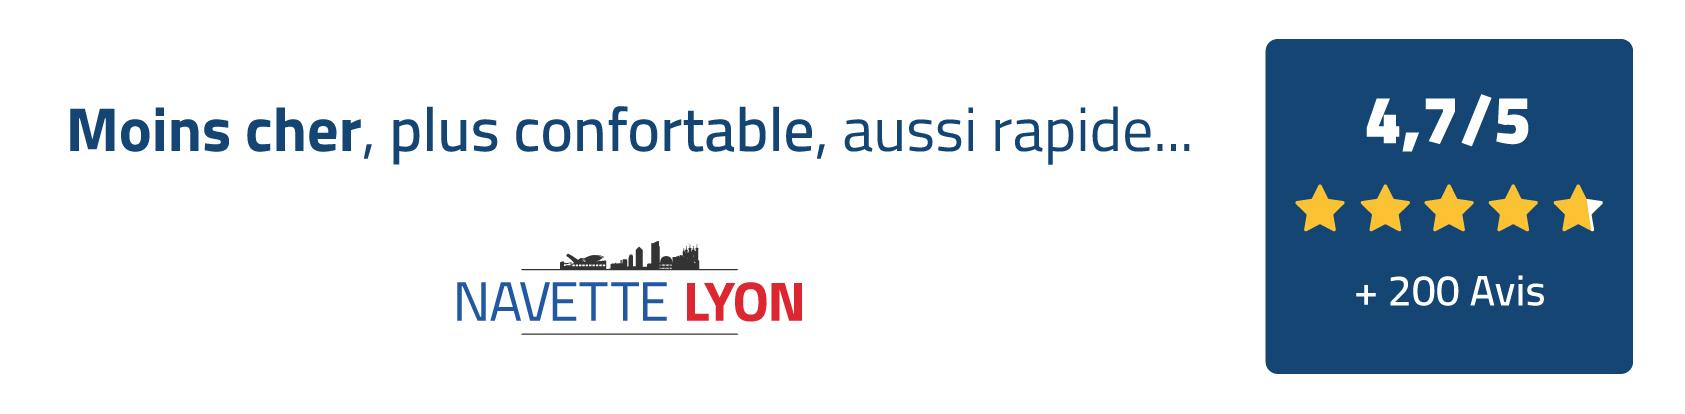 Bandeau Navette Lyon